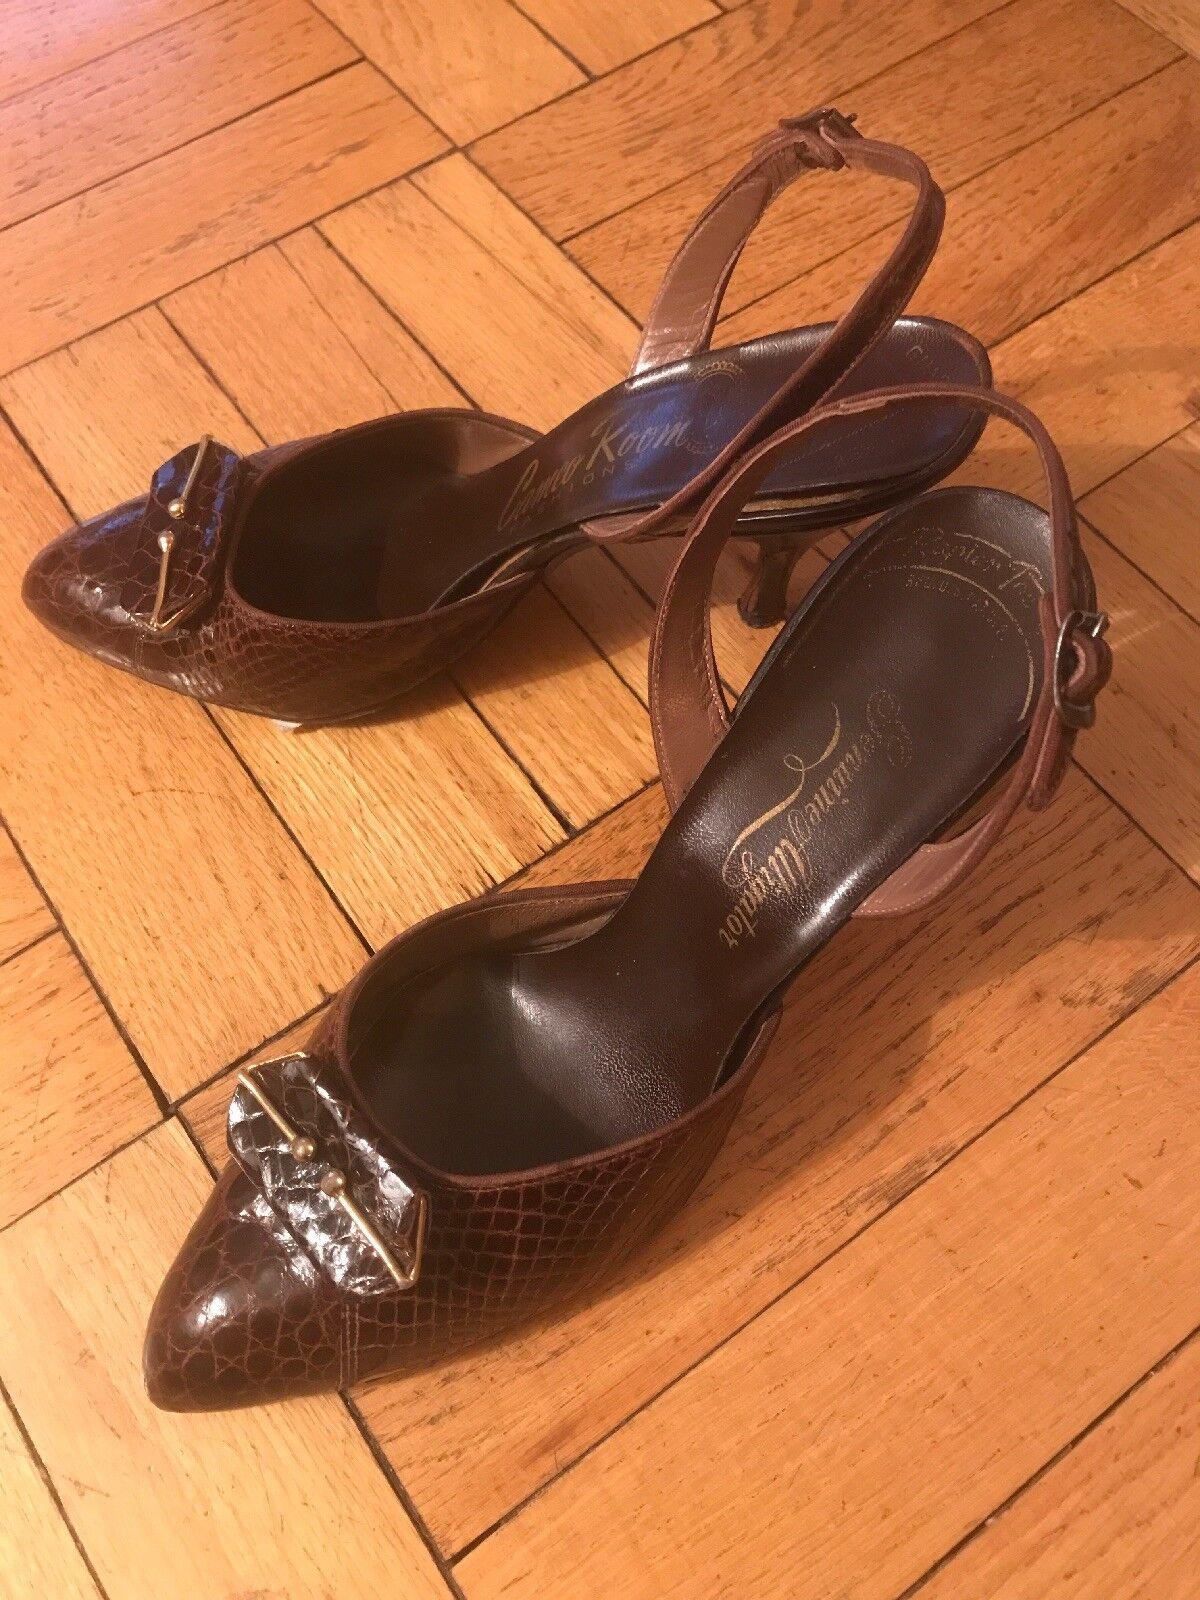 Vintage Cameo Room Fashions Genuine Classic Slingback Heels